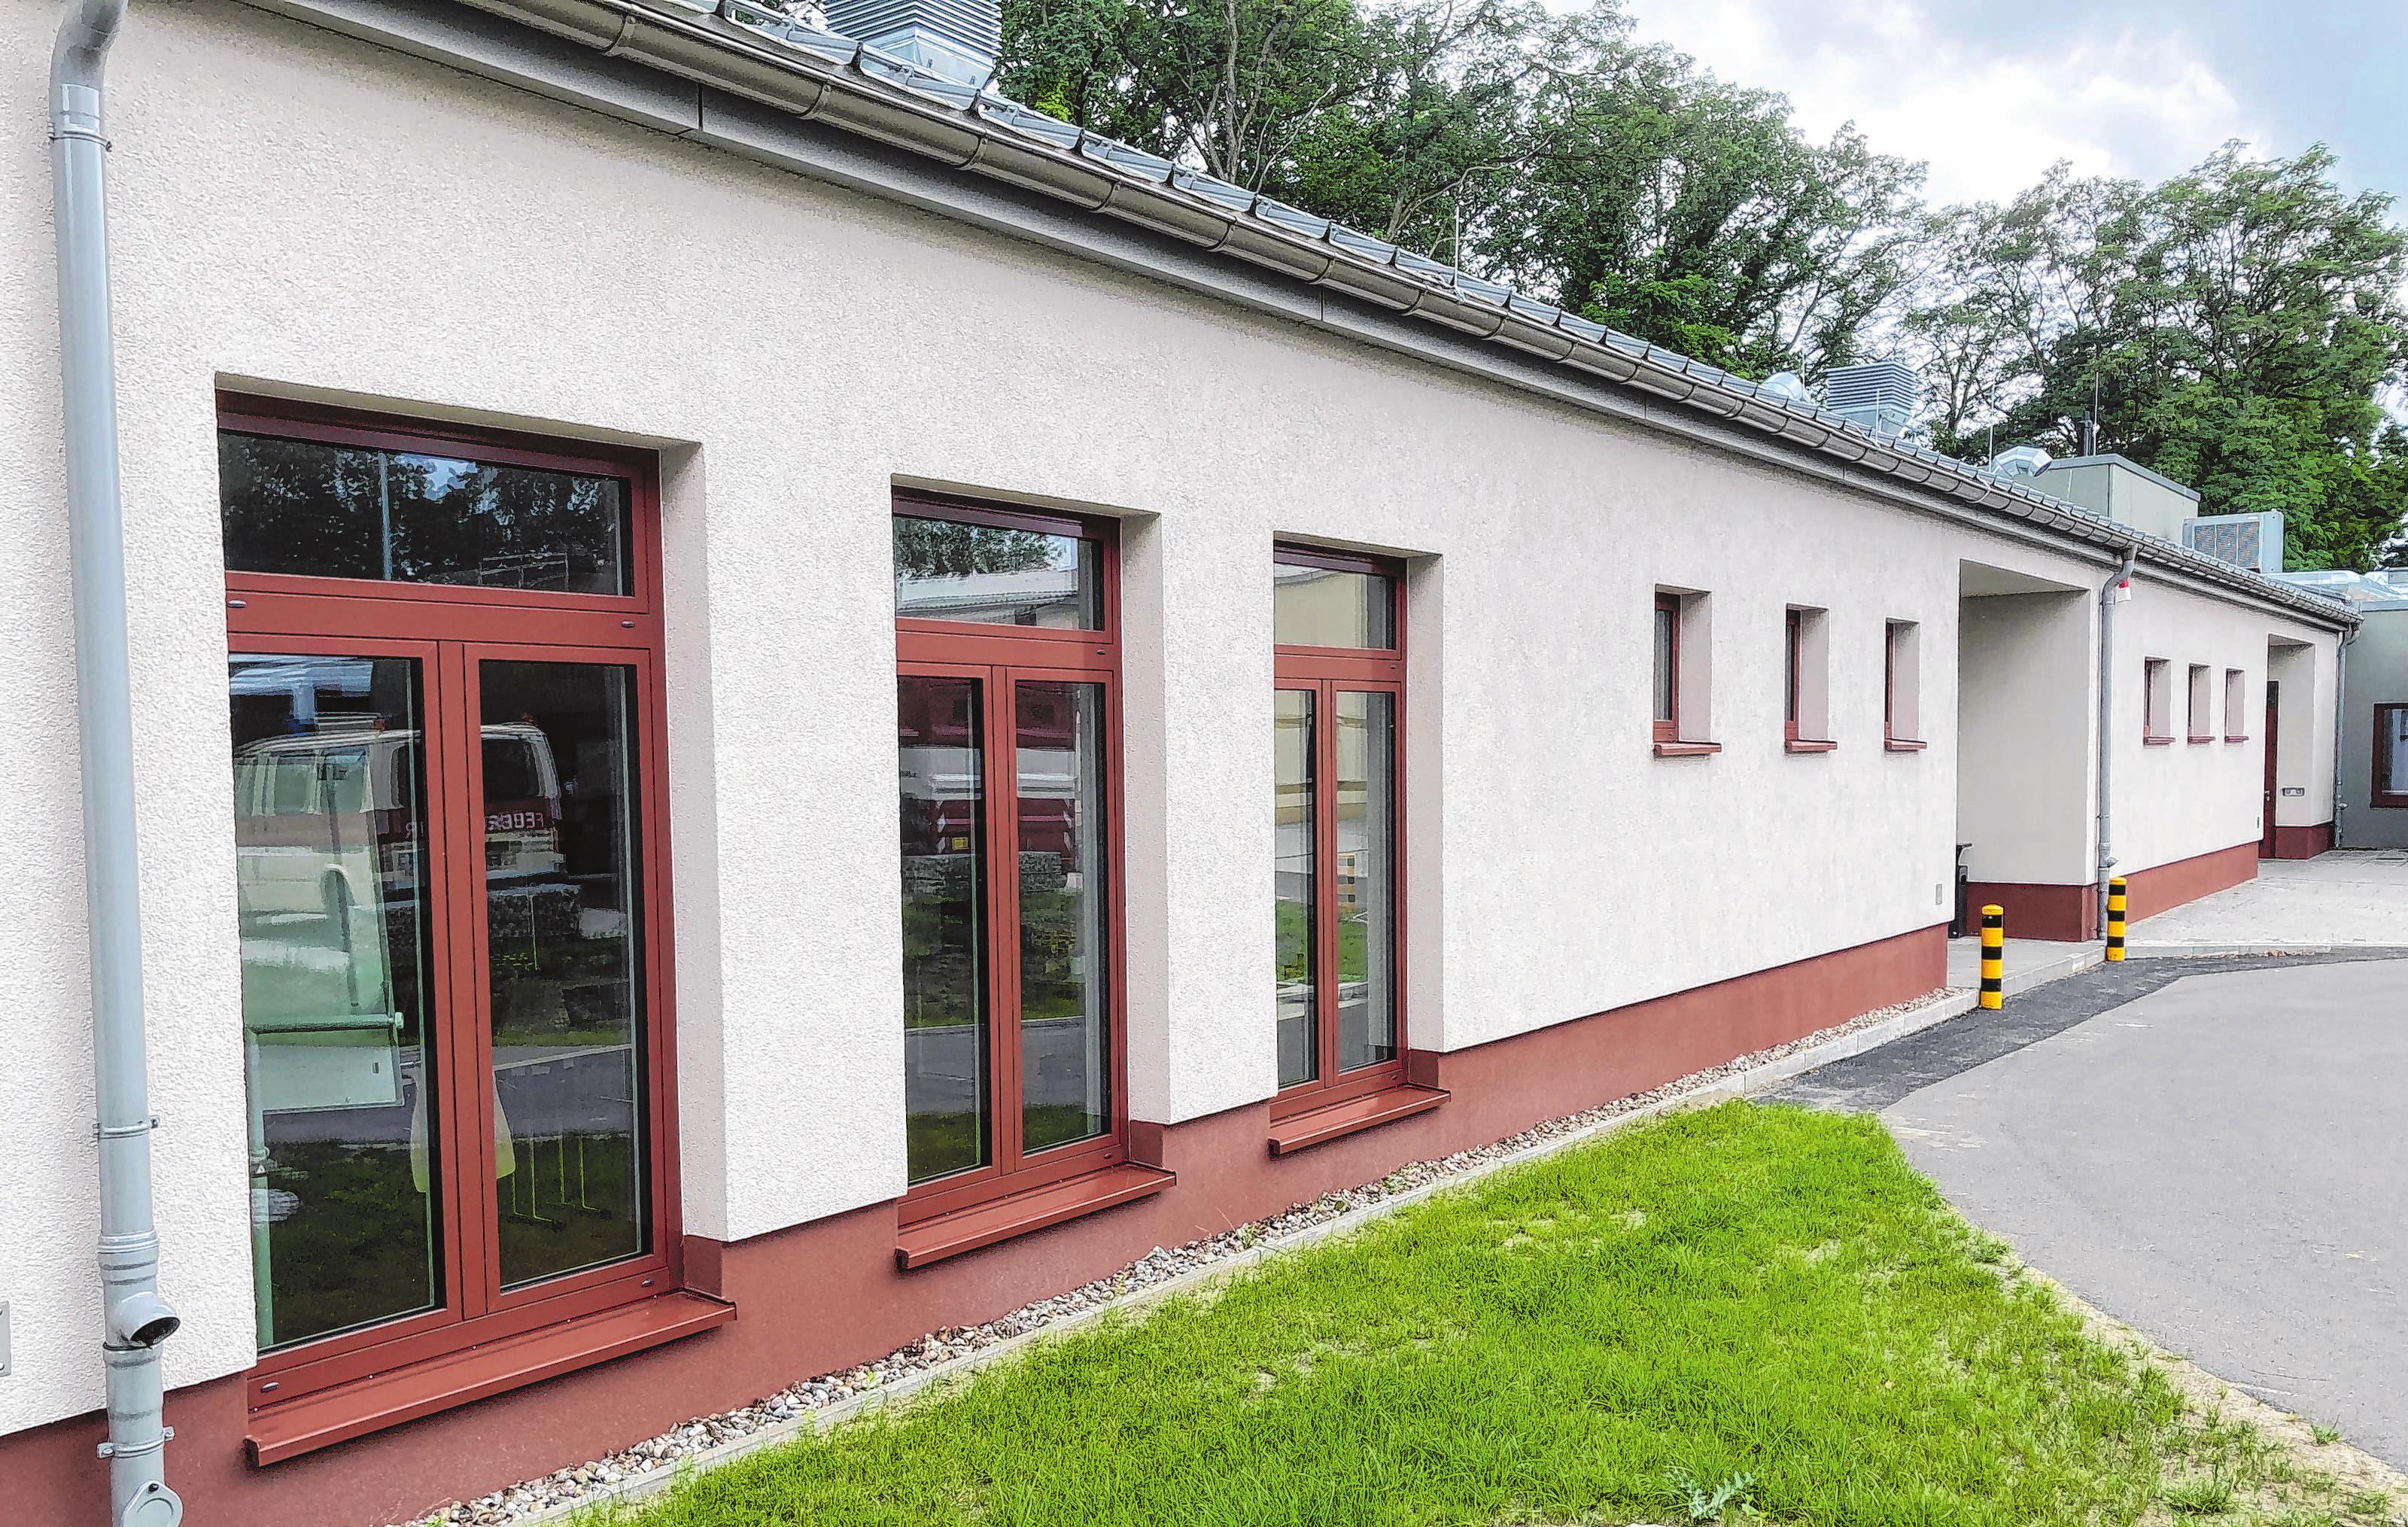 Haus III, fertiggestellt im ersten Quartal 2021. Foto: René Wernitz